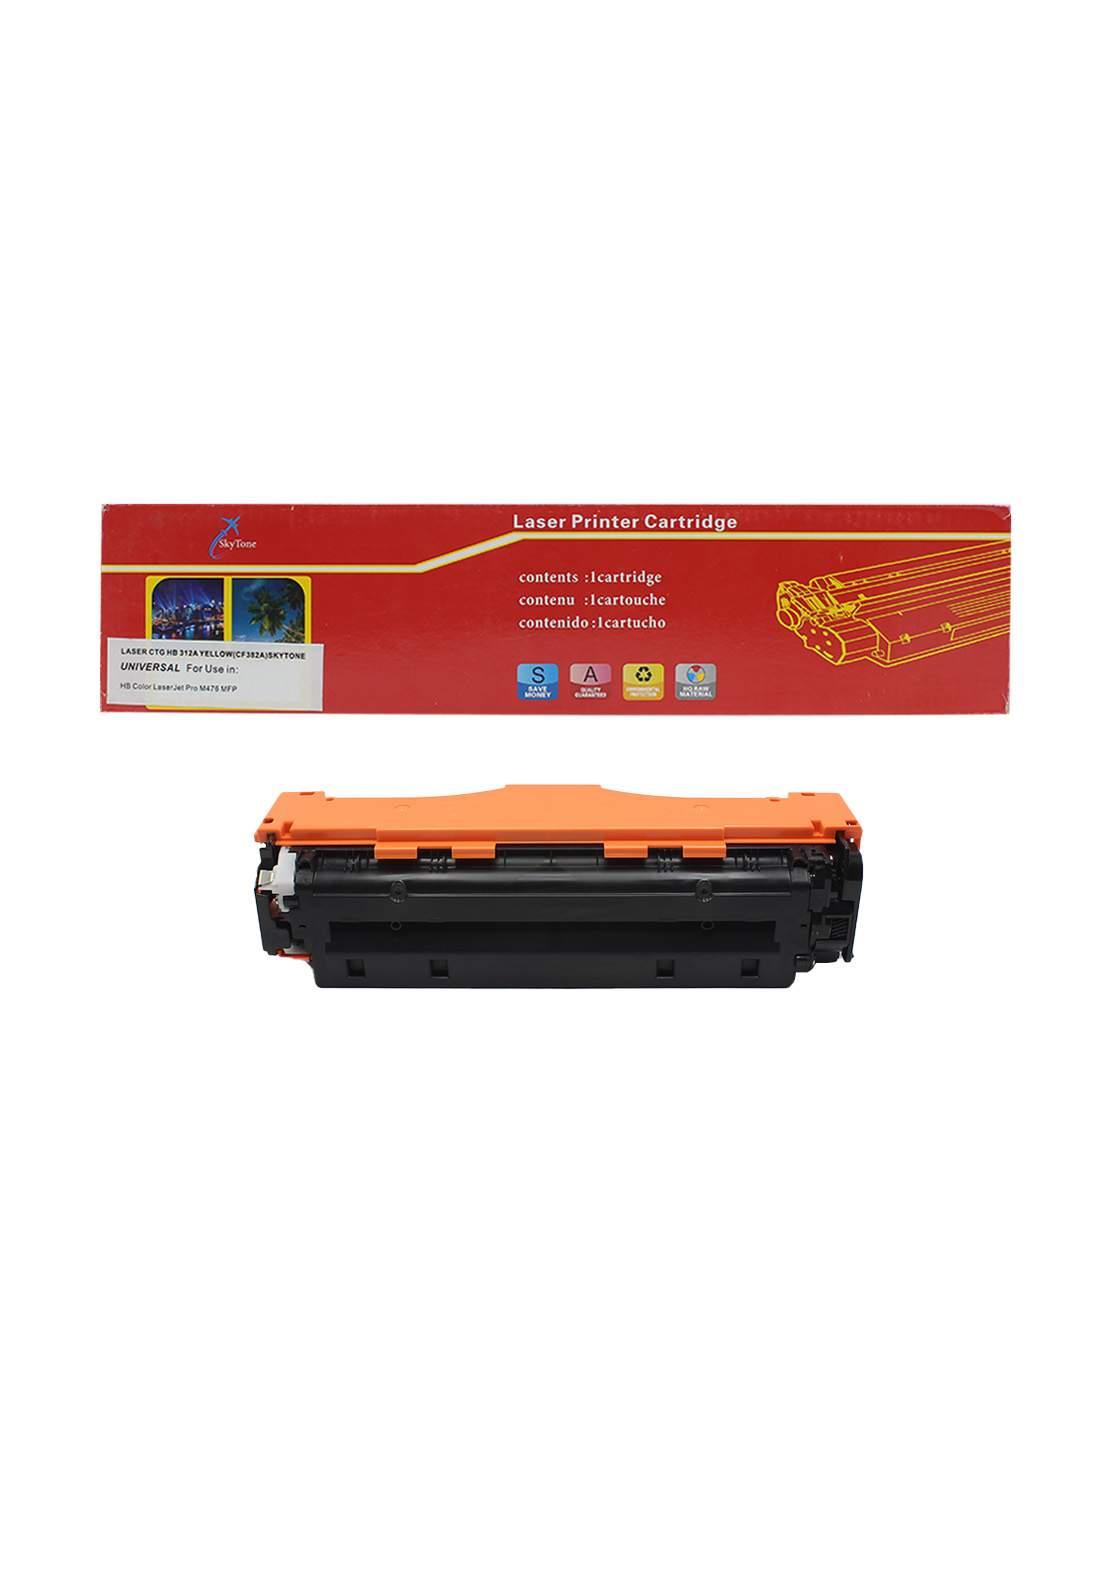 SKYTONE CTG HP 312A (CF382A) Laser Printer Toner Cartridge خرطوشة حبر